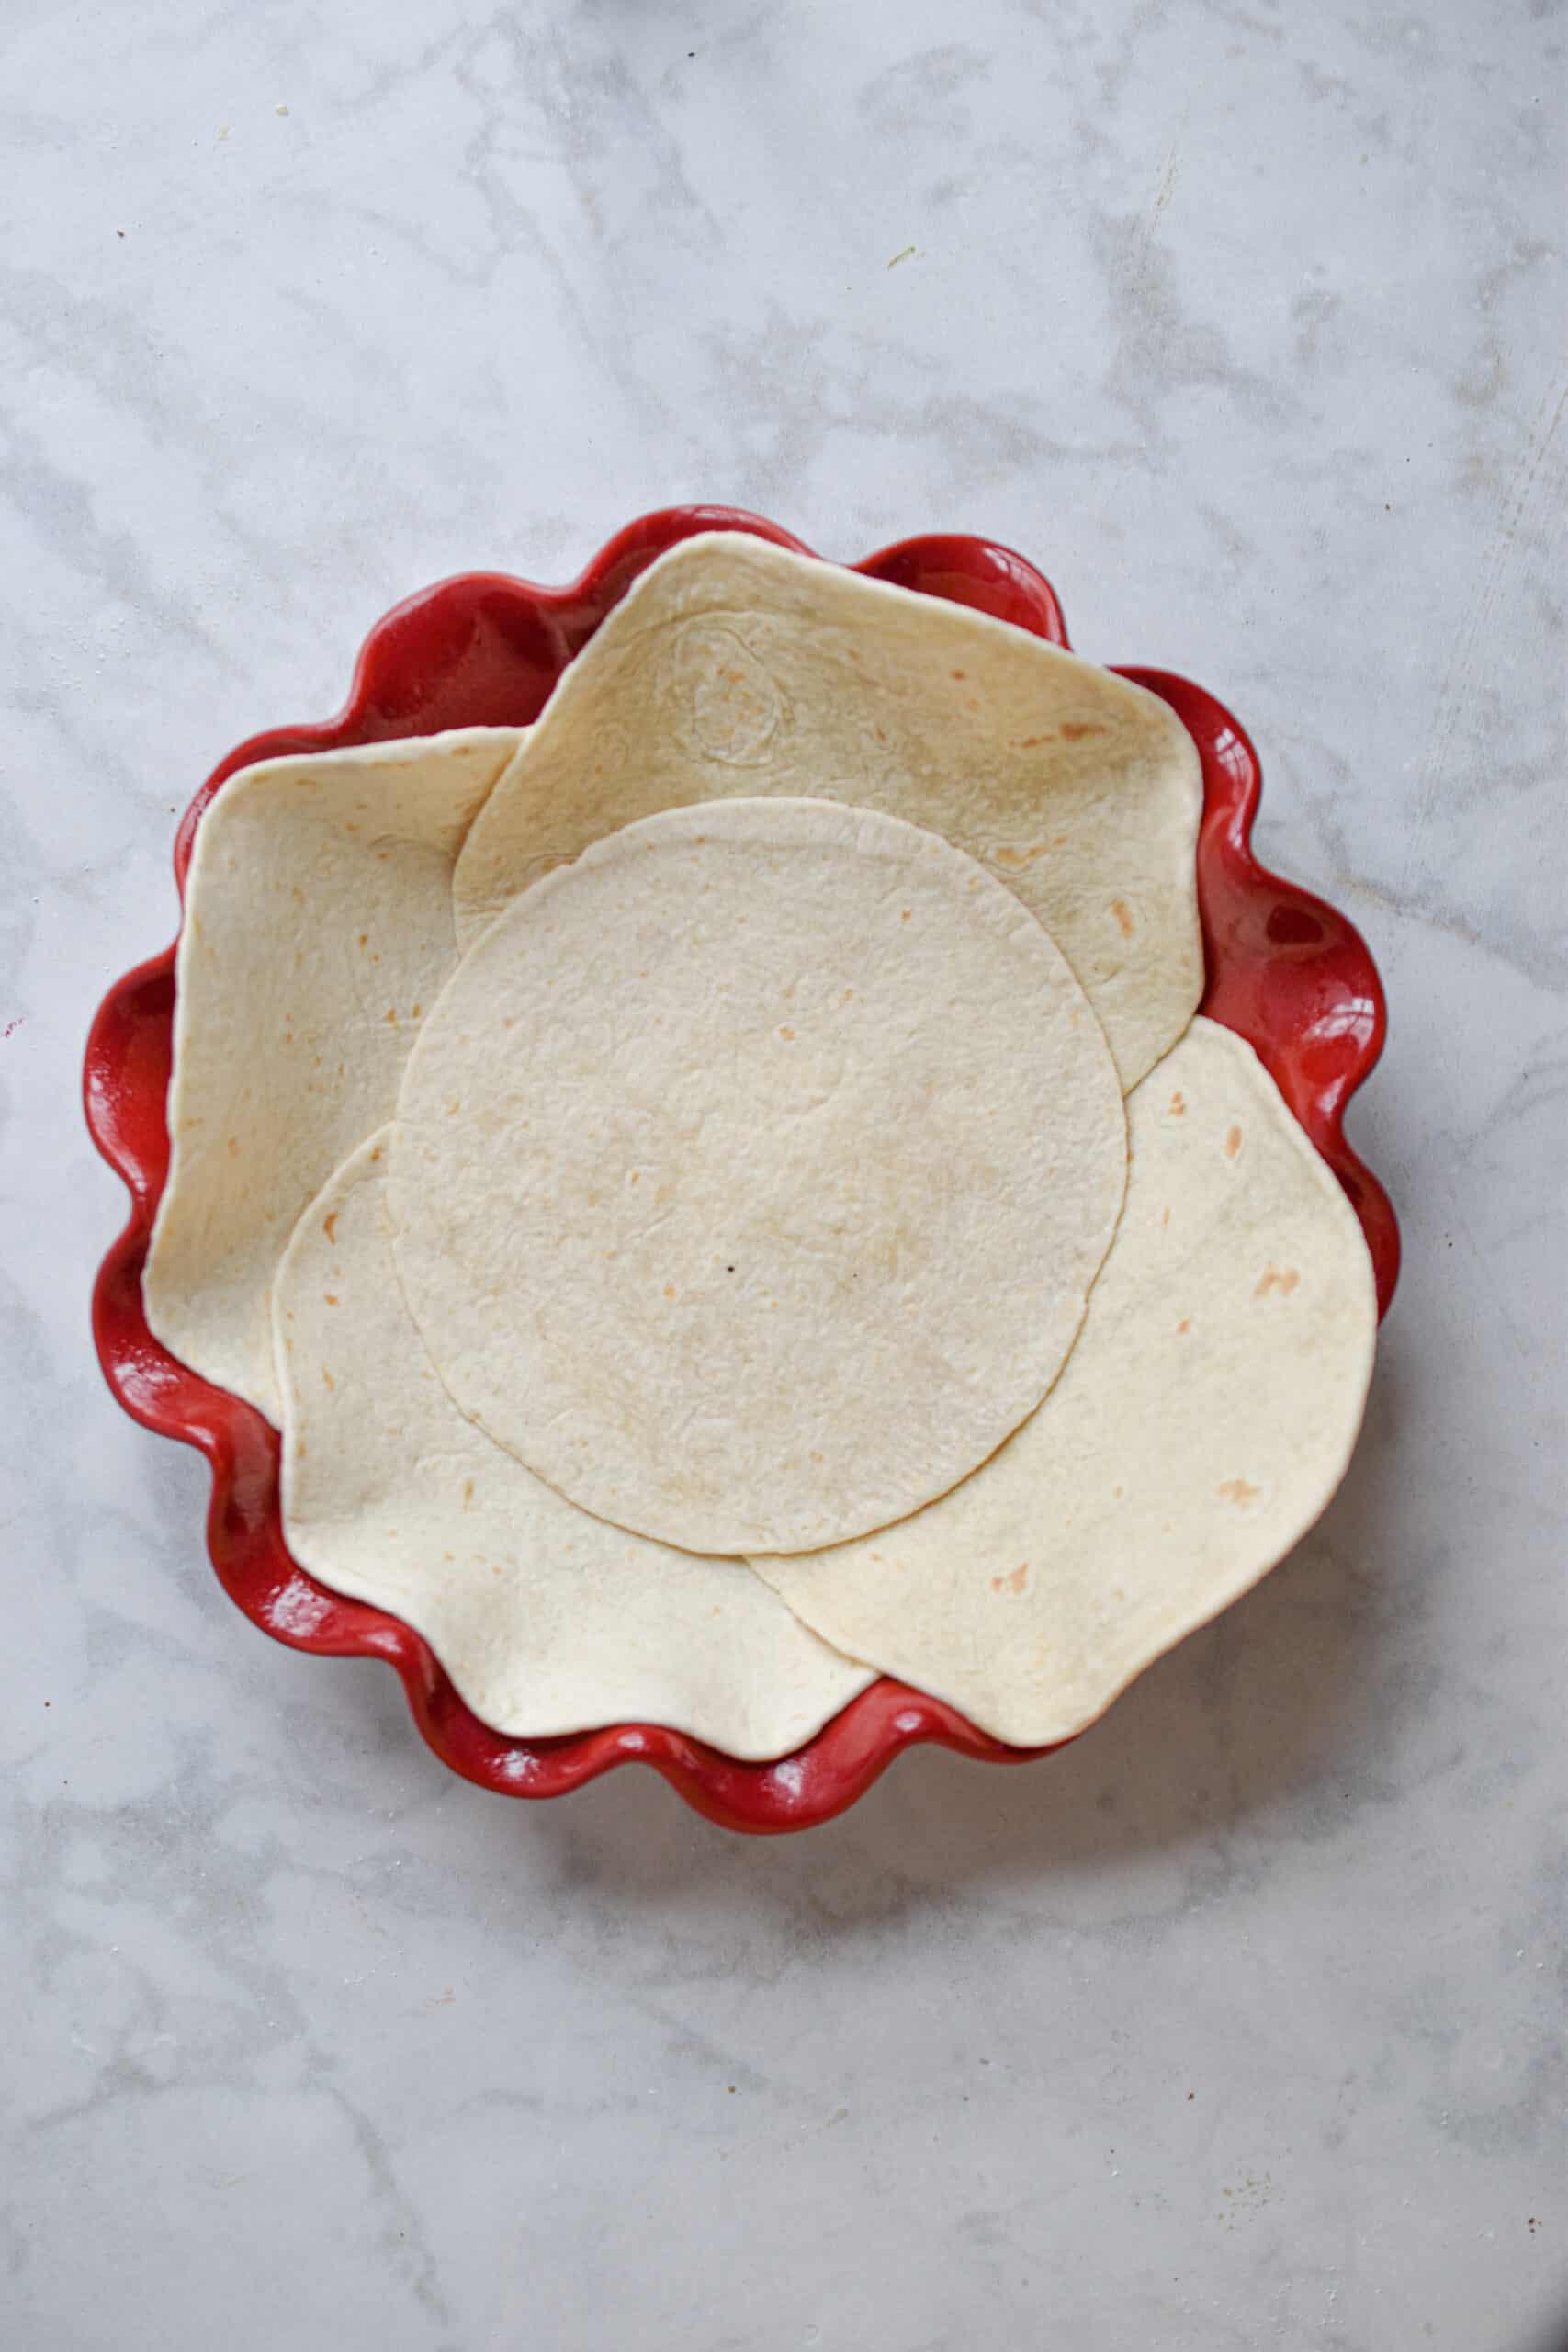 line the pie pan with flour tortillas